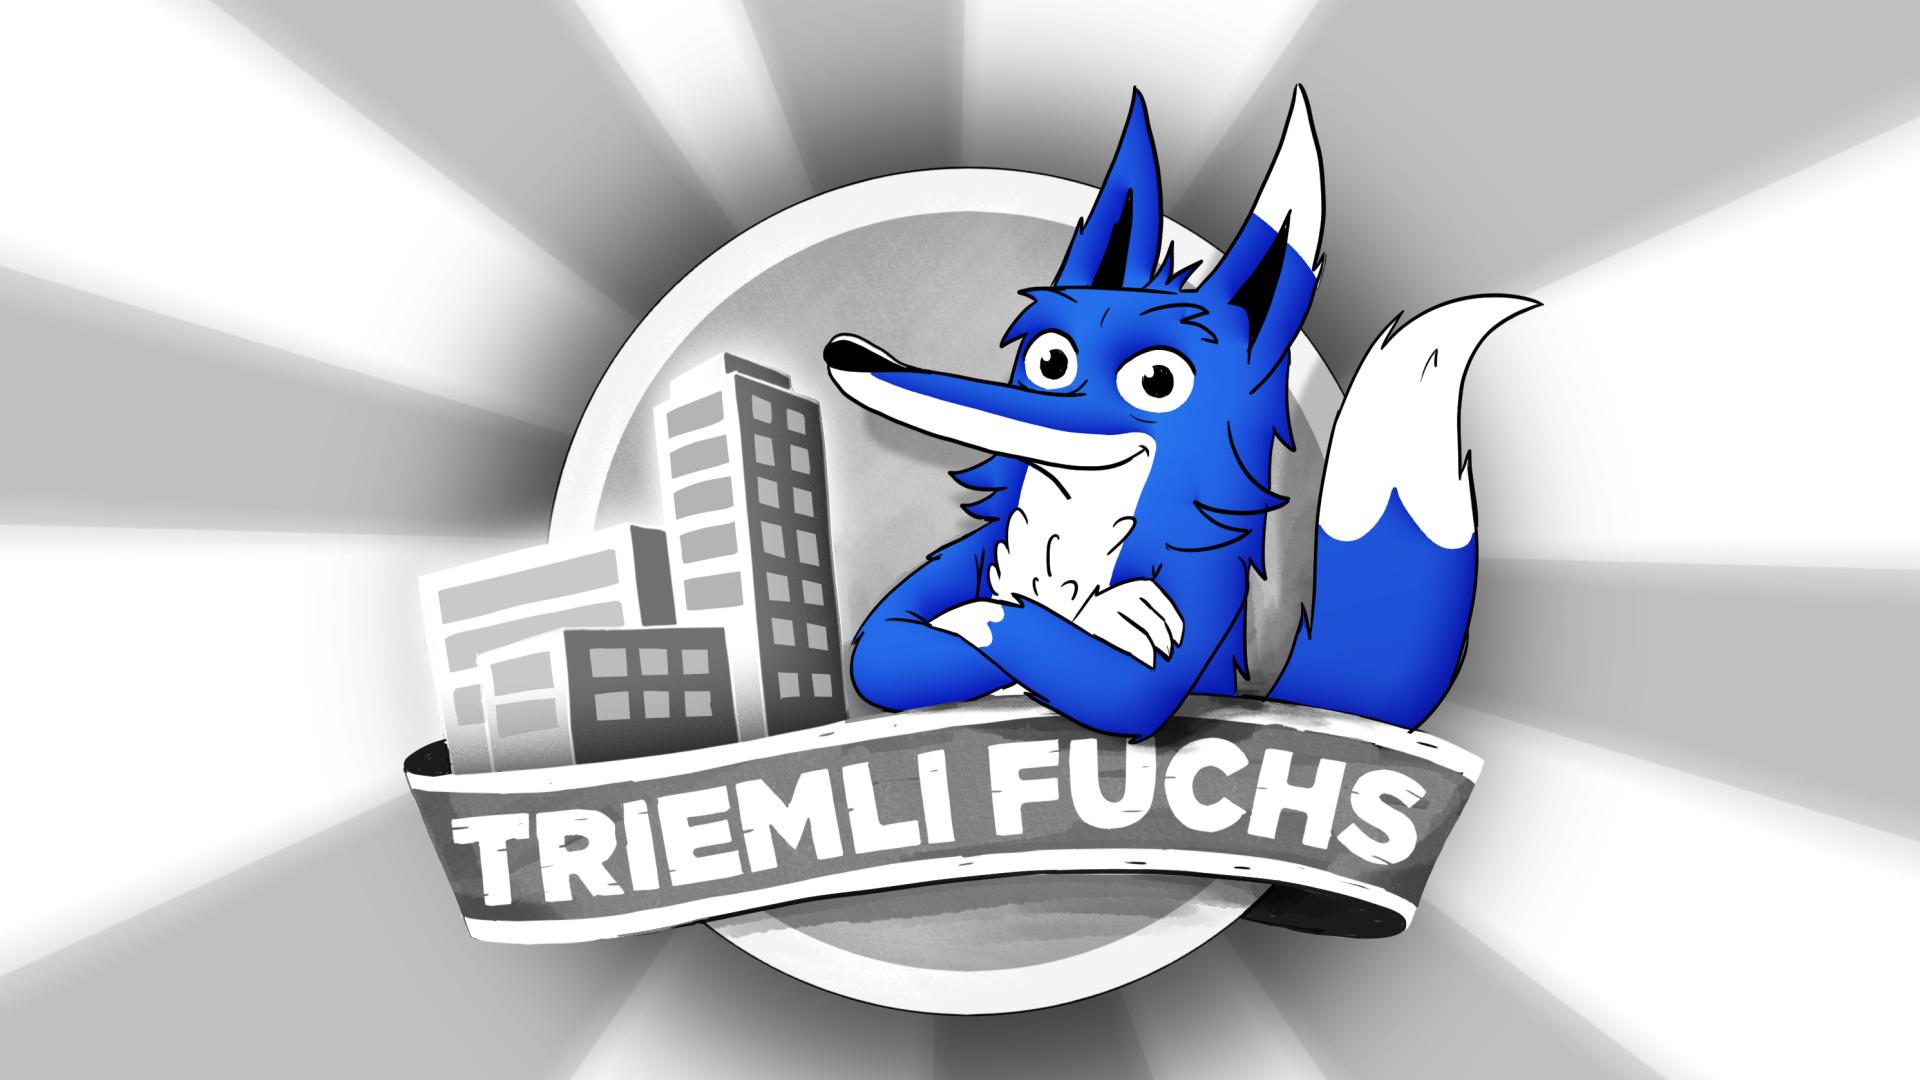 treimlifuchs_logo.jpg